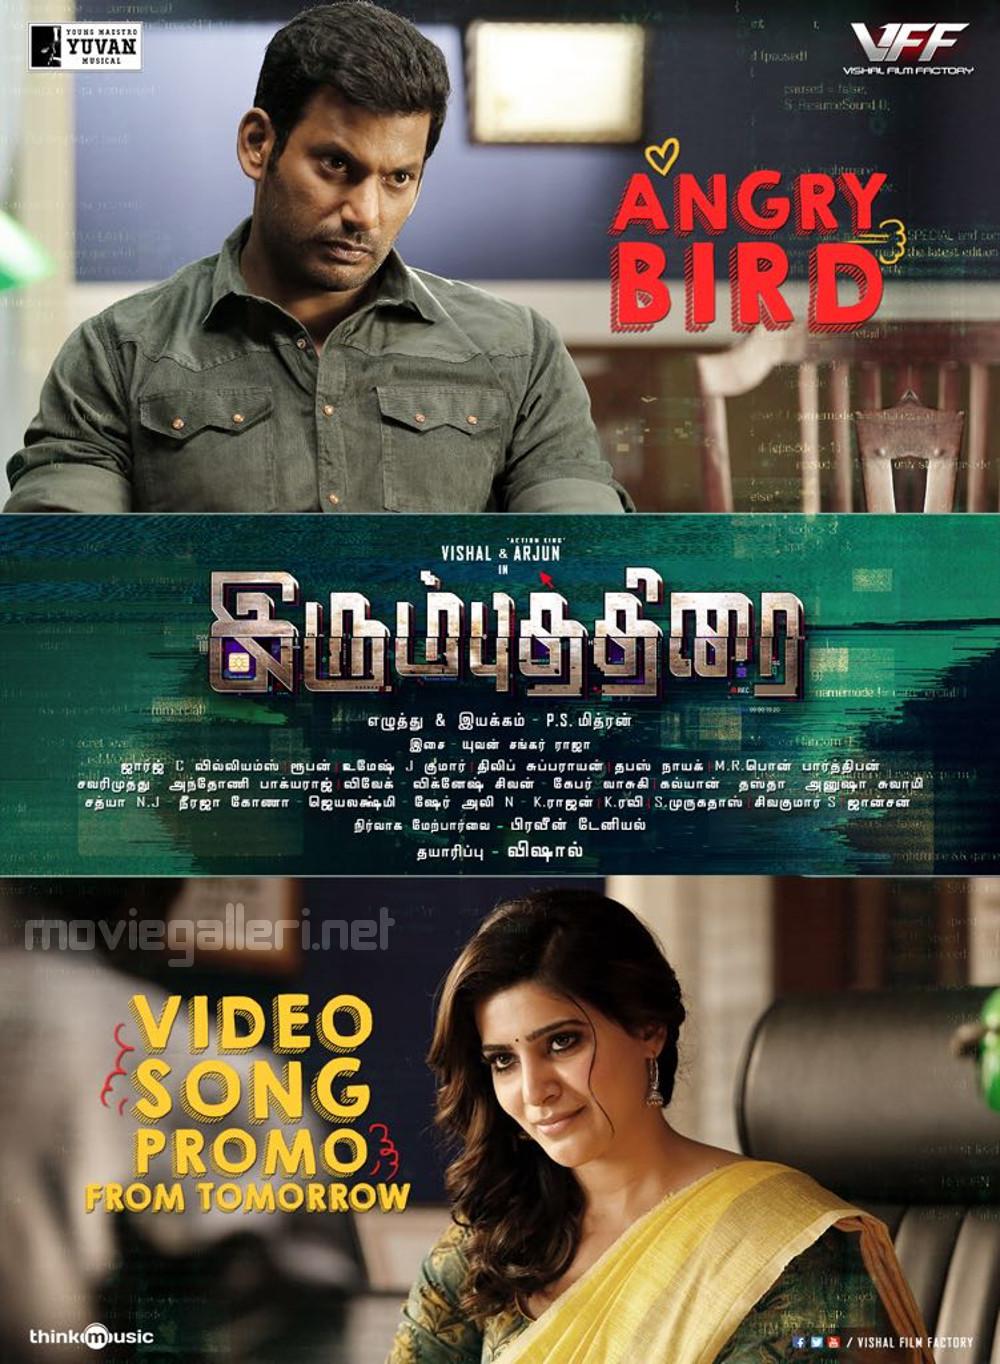 Vishal Samantha Irumbu Thirai Angry Bird Video Song Promo Release Posters